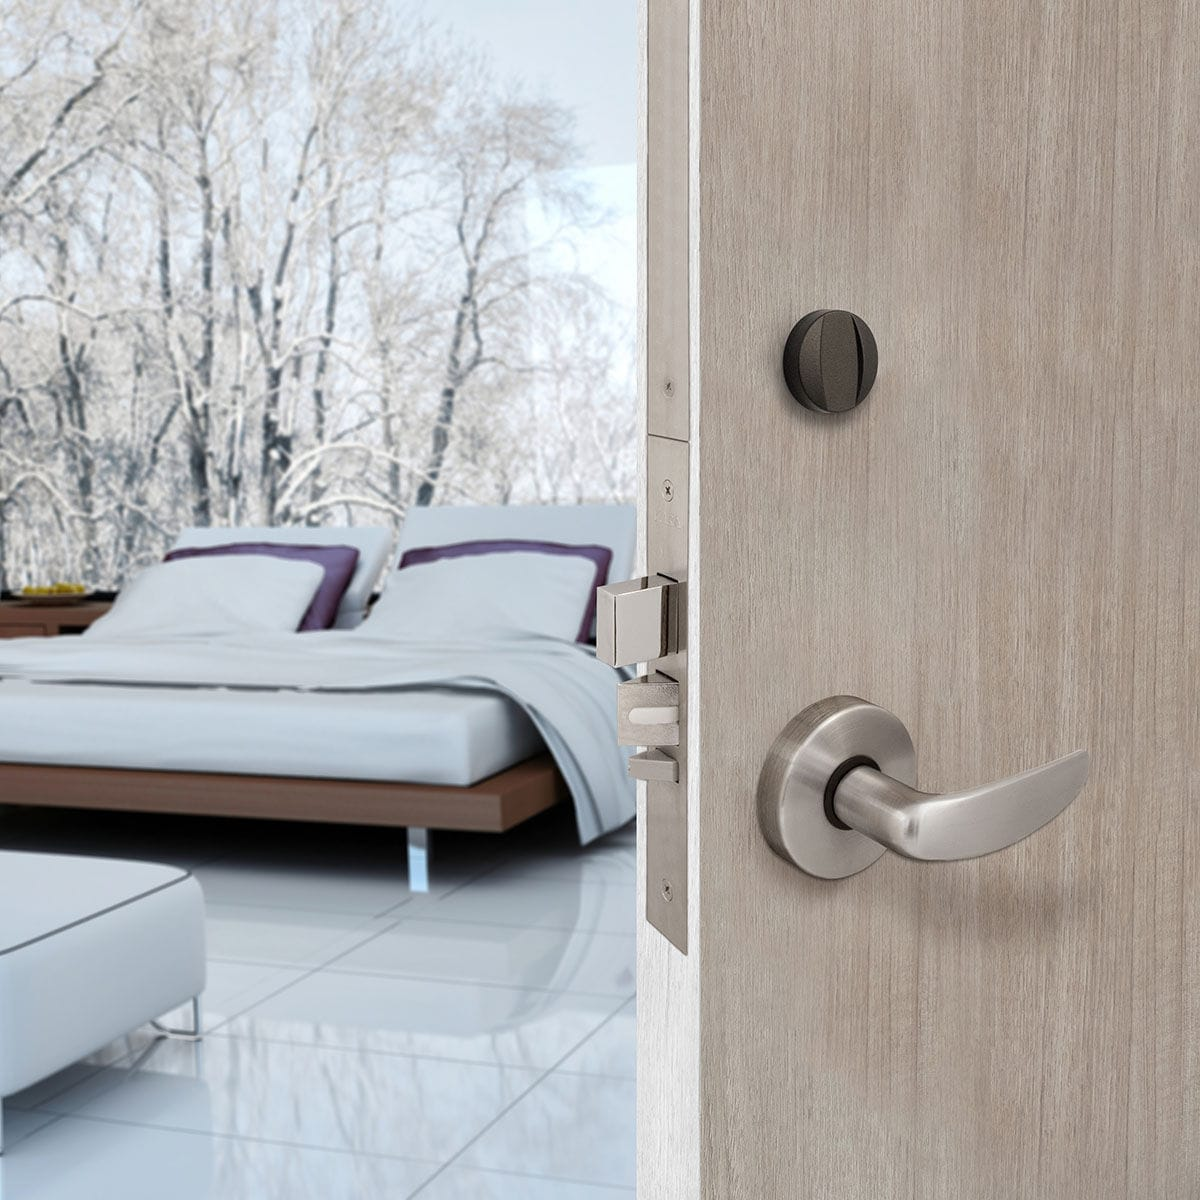 Electronic lock / door / RFID / high-security - SAFLOK